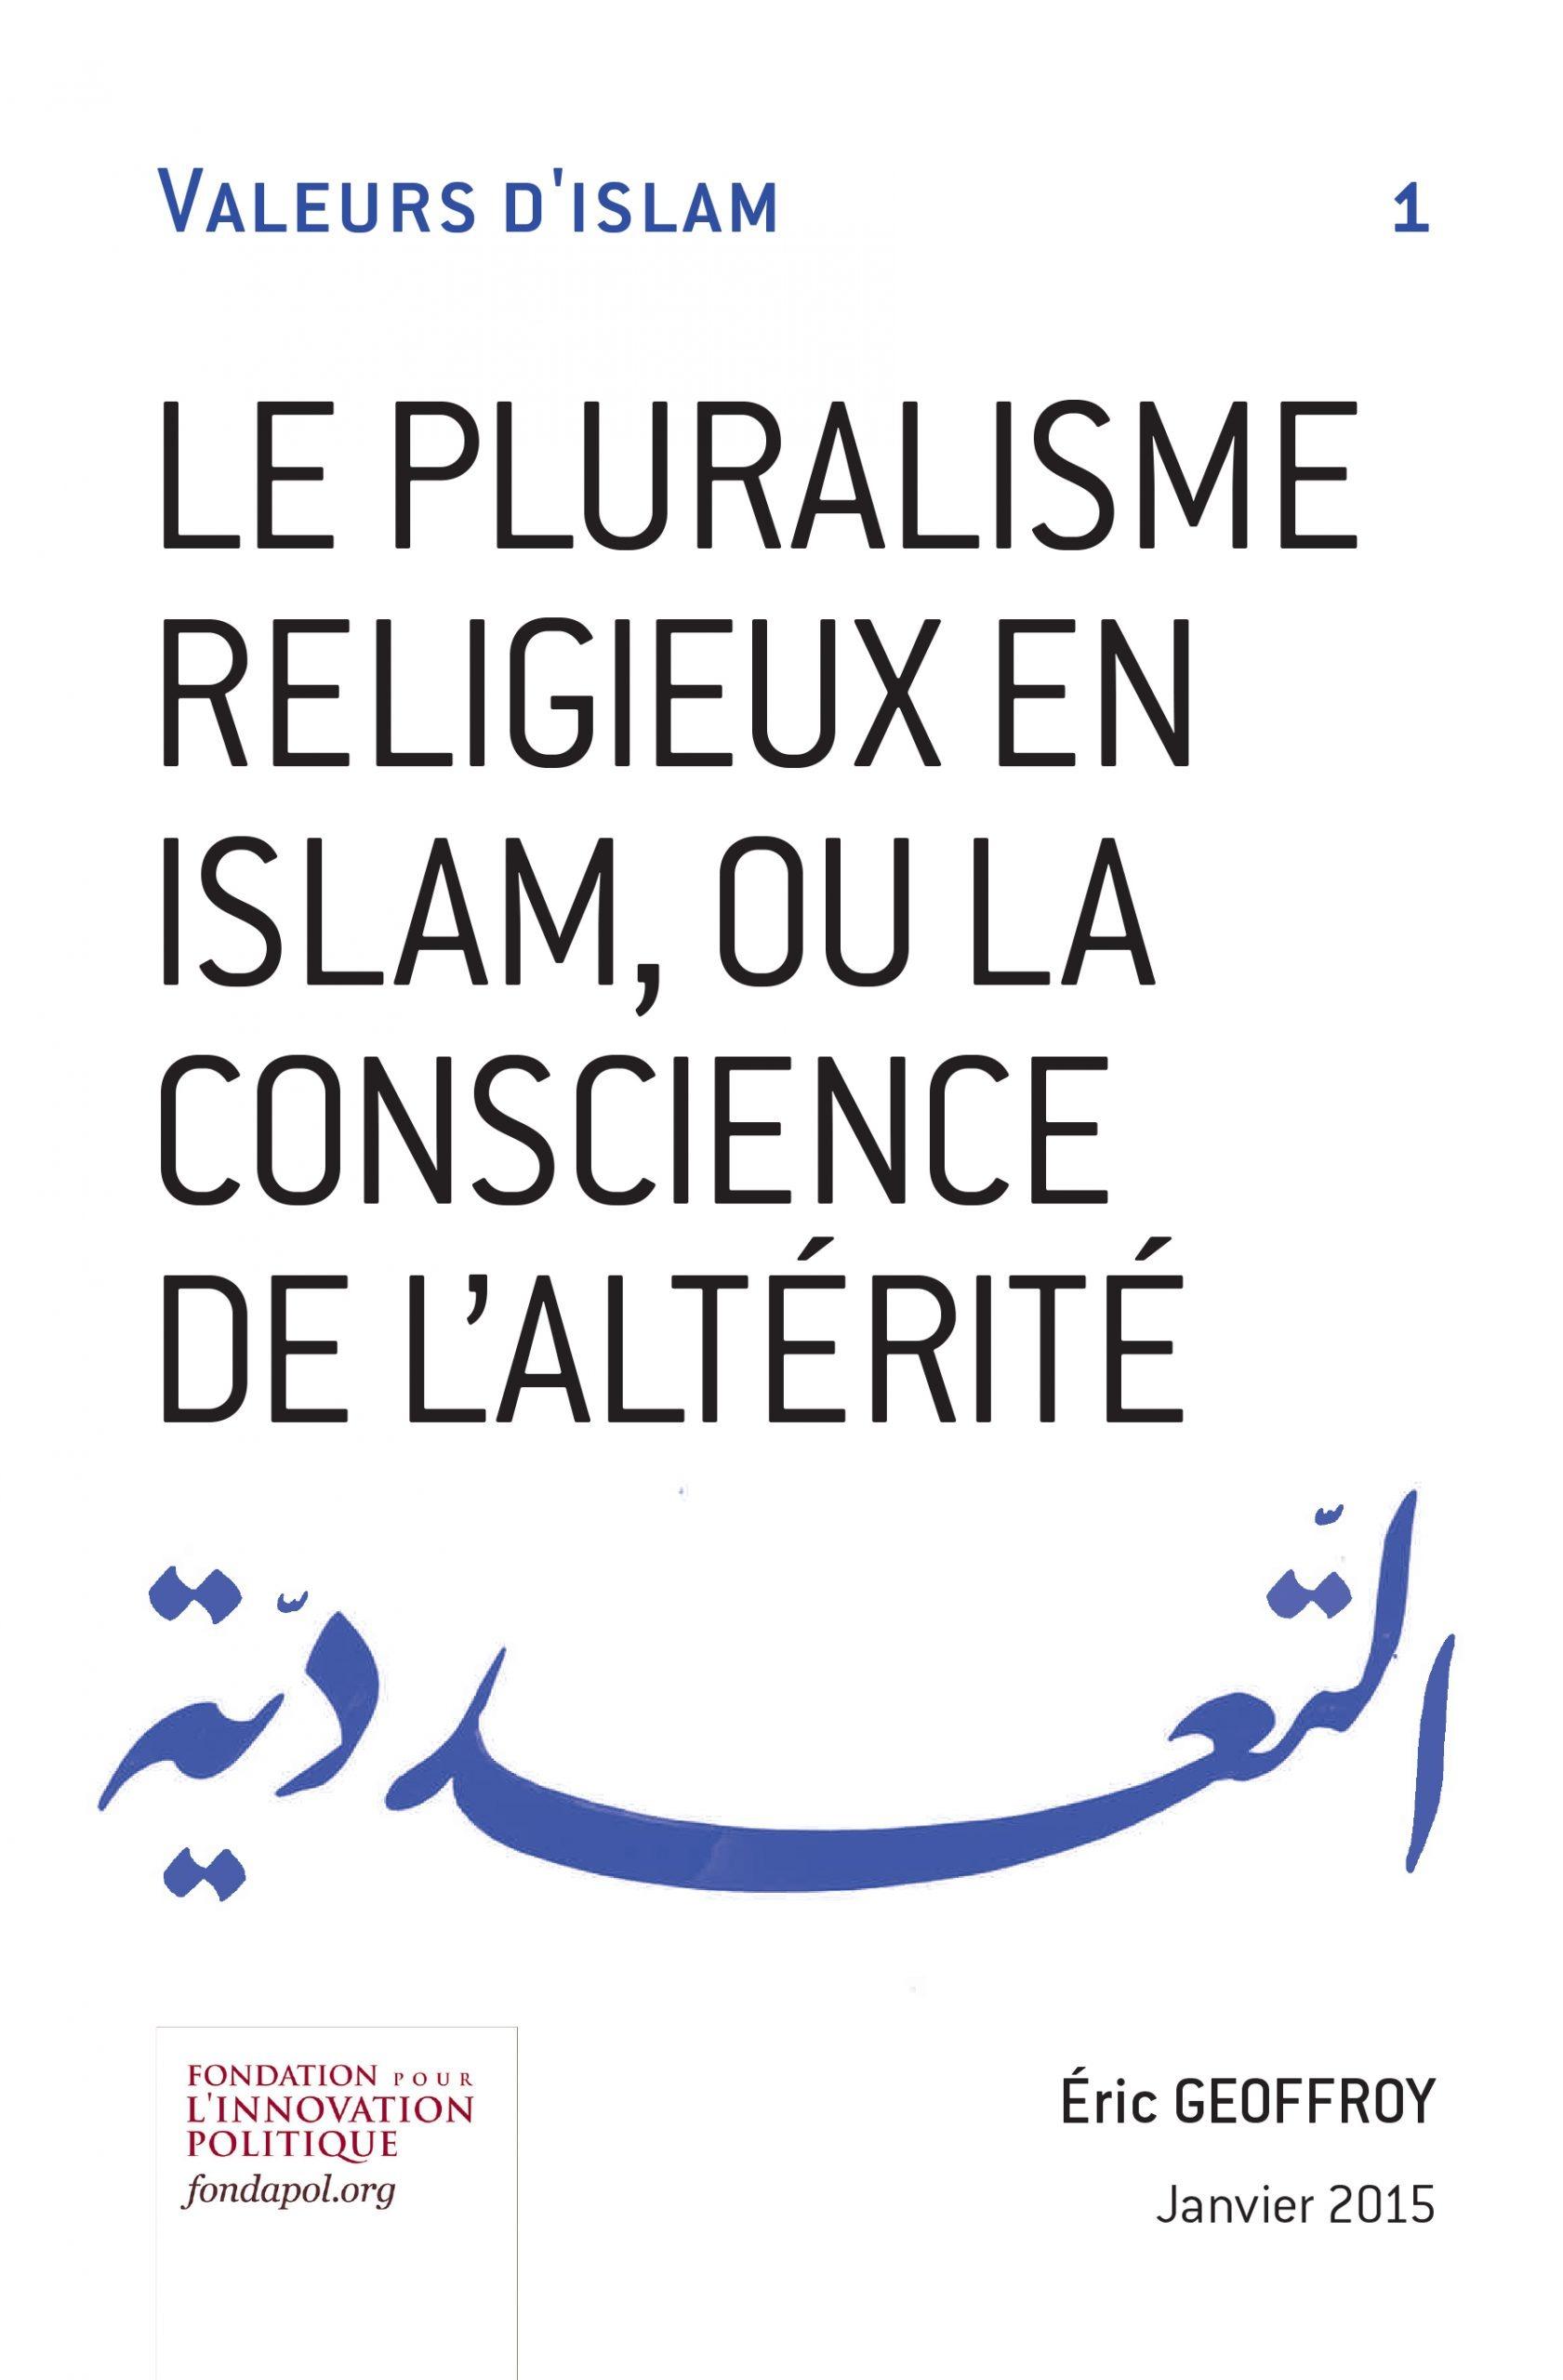 066-SERIE-ISLAM-E.Geoffroy-COUV